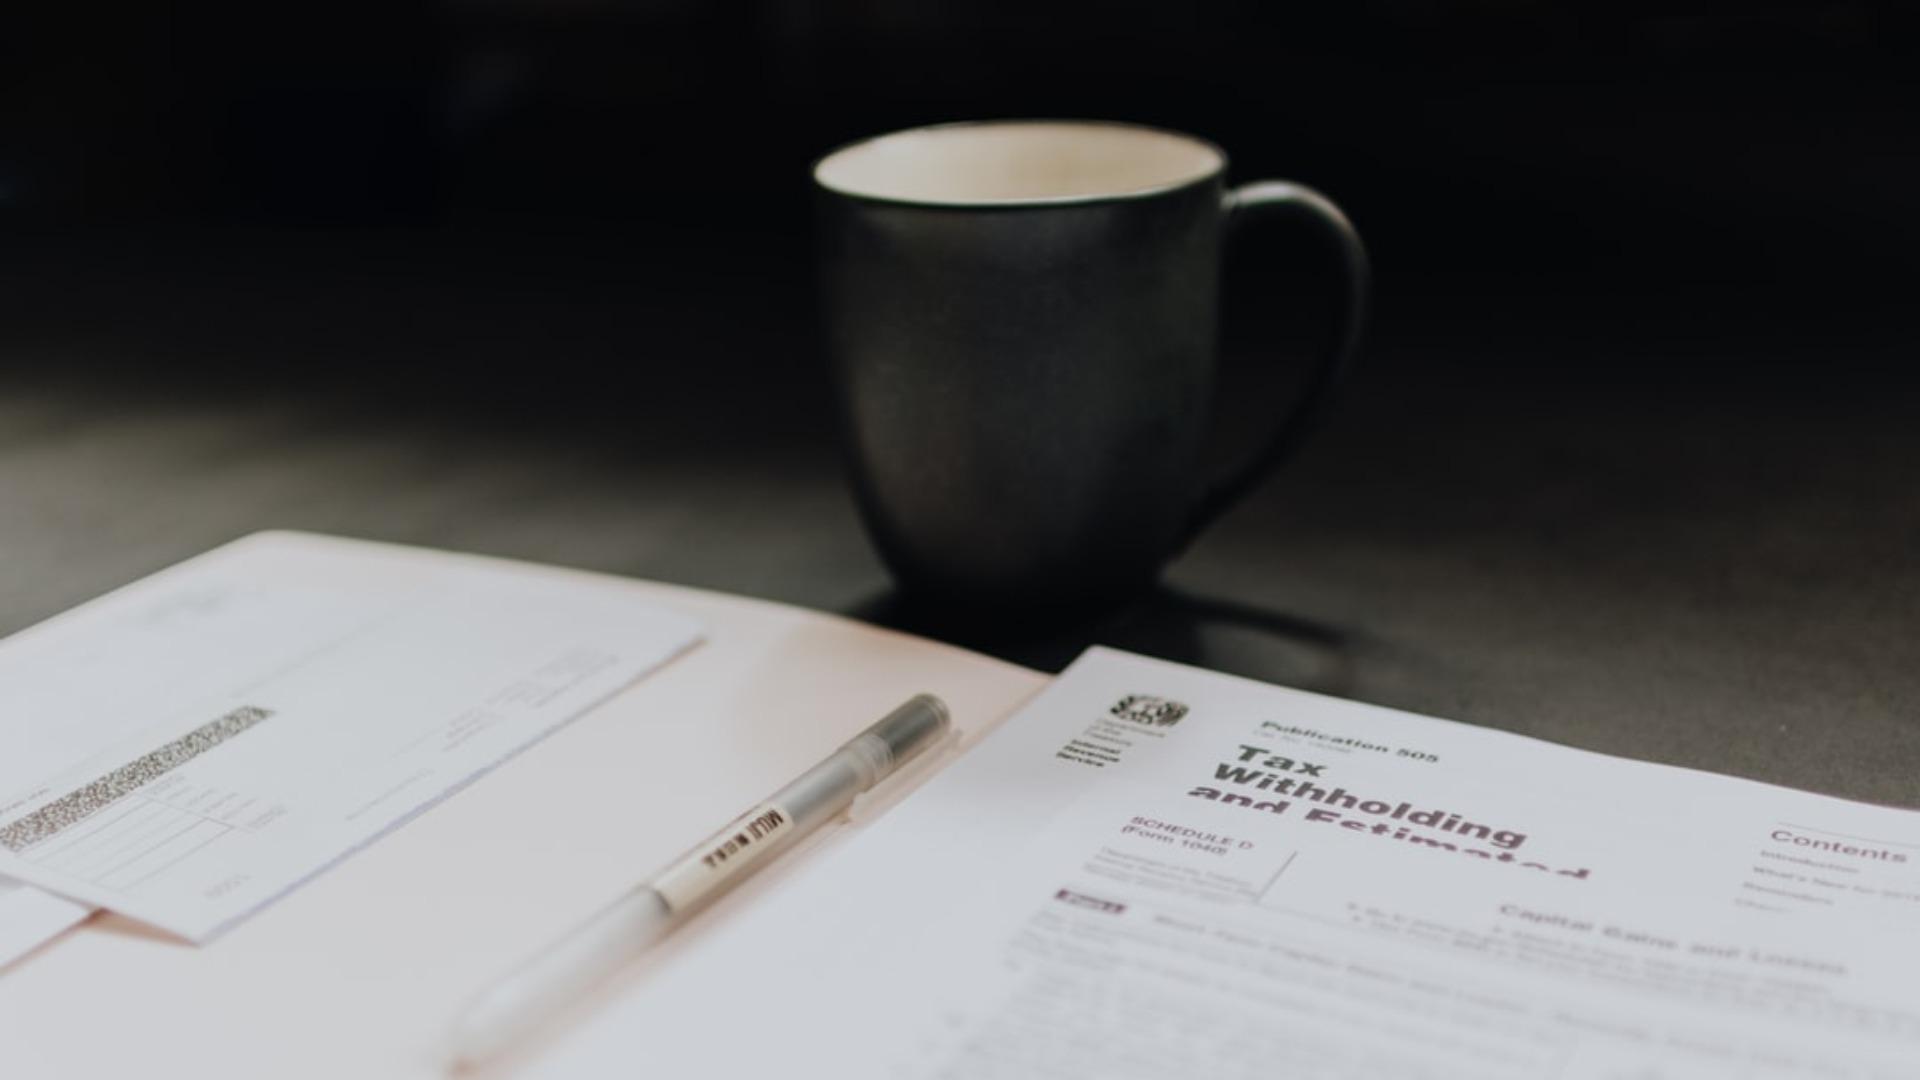 dokumenti likumi